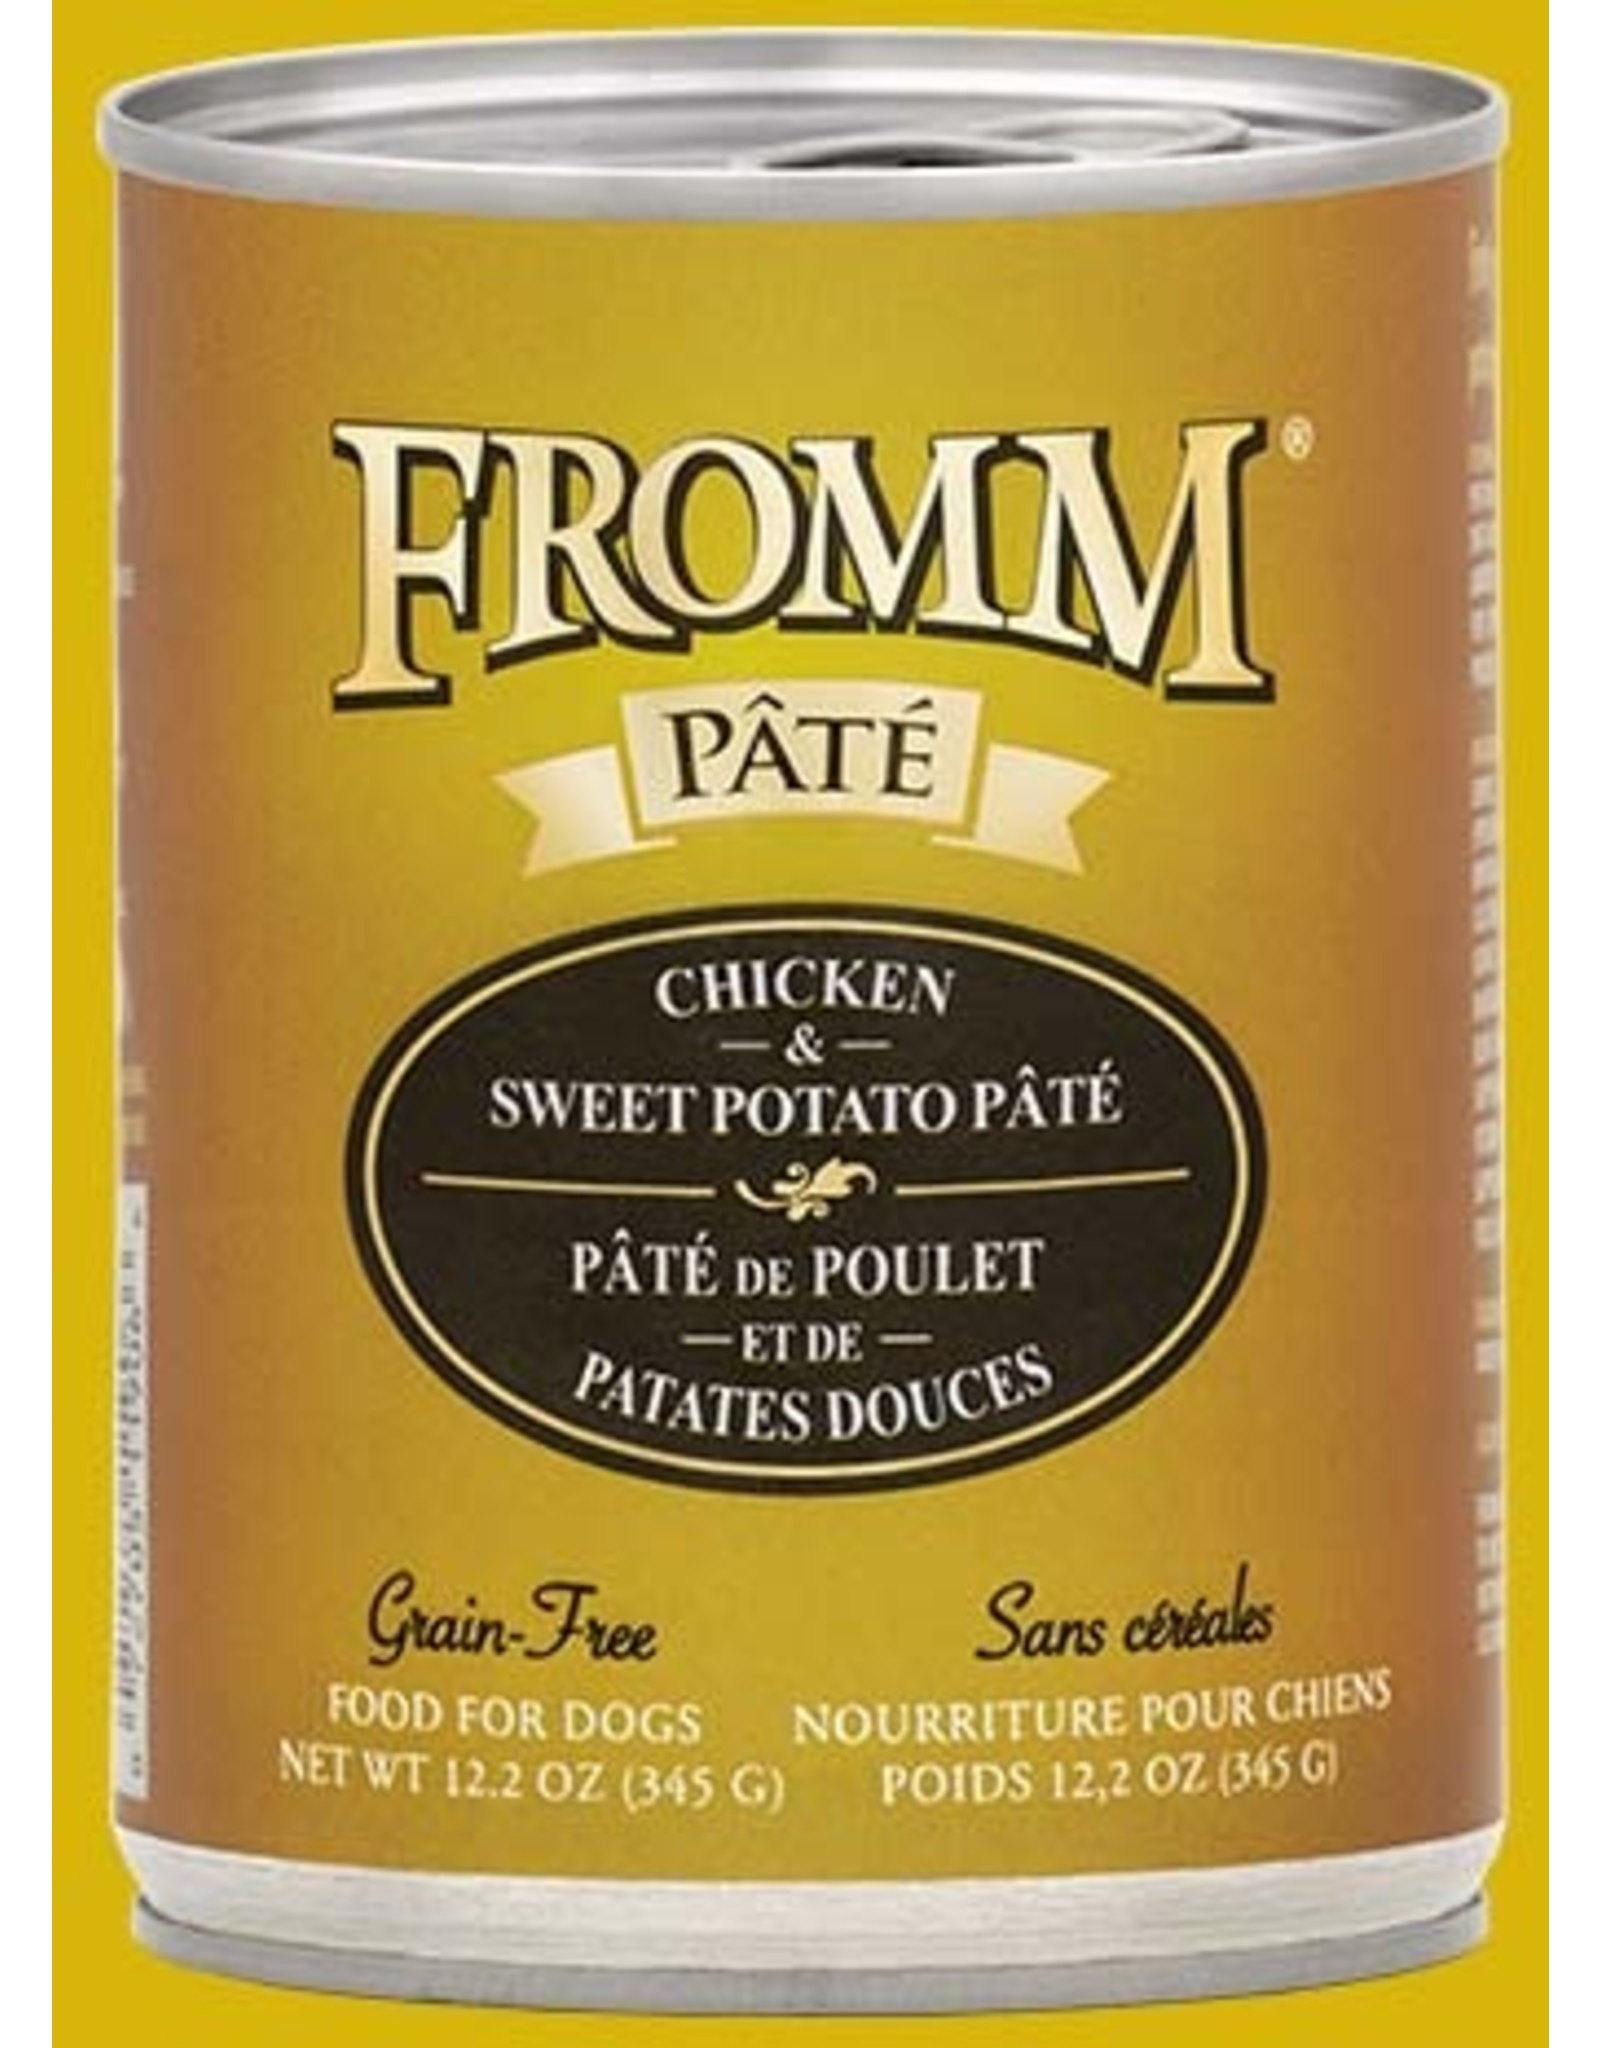 Fromm Fromm Gold Grain Free Chicken & Sweet Potato Pate Wet Food